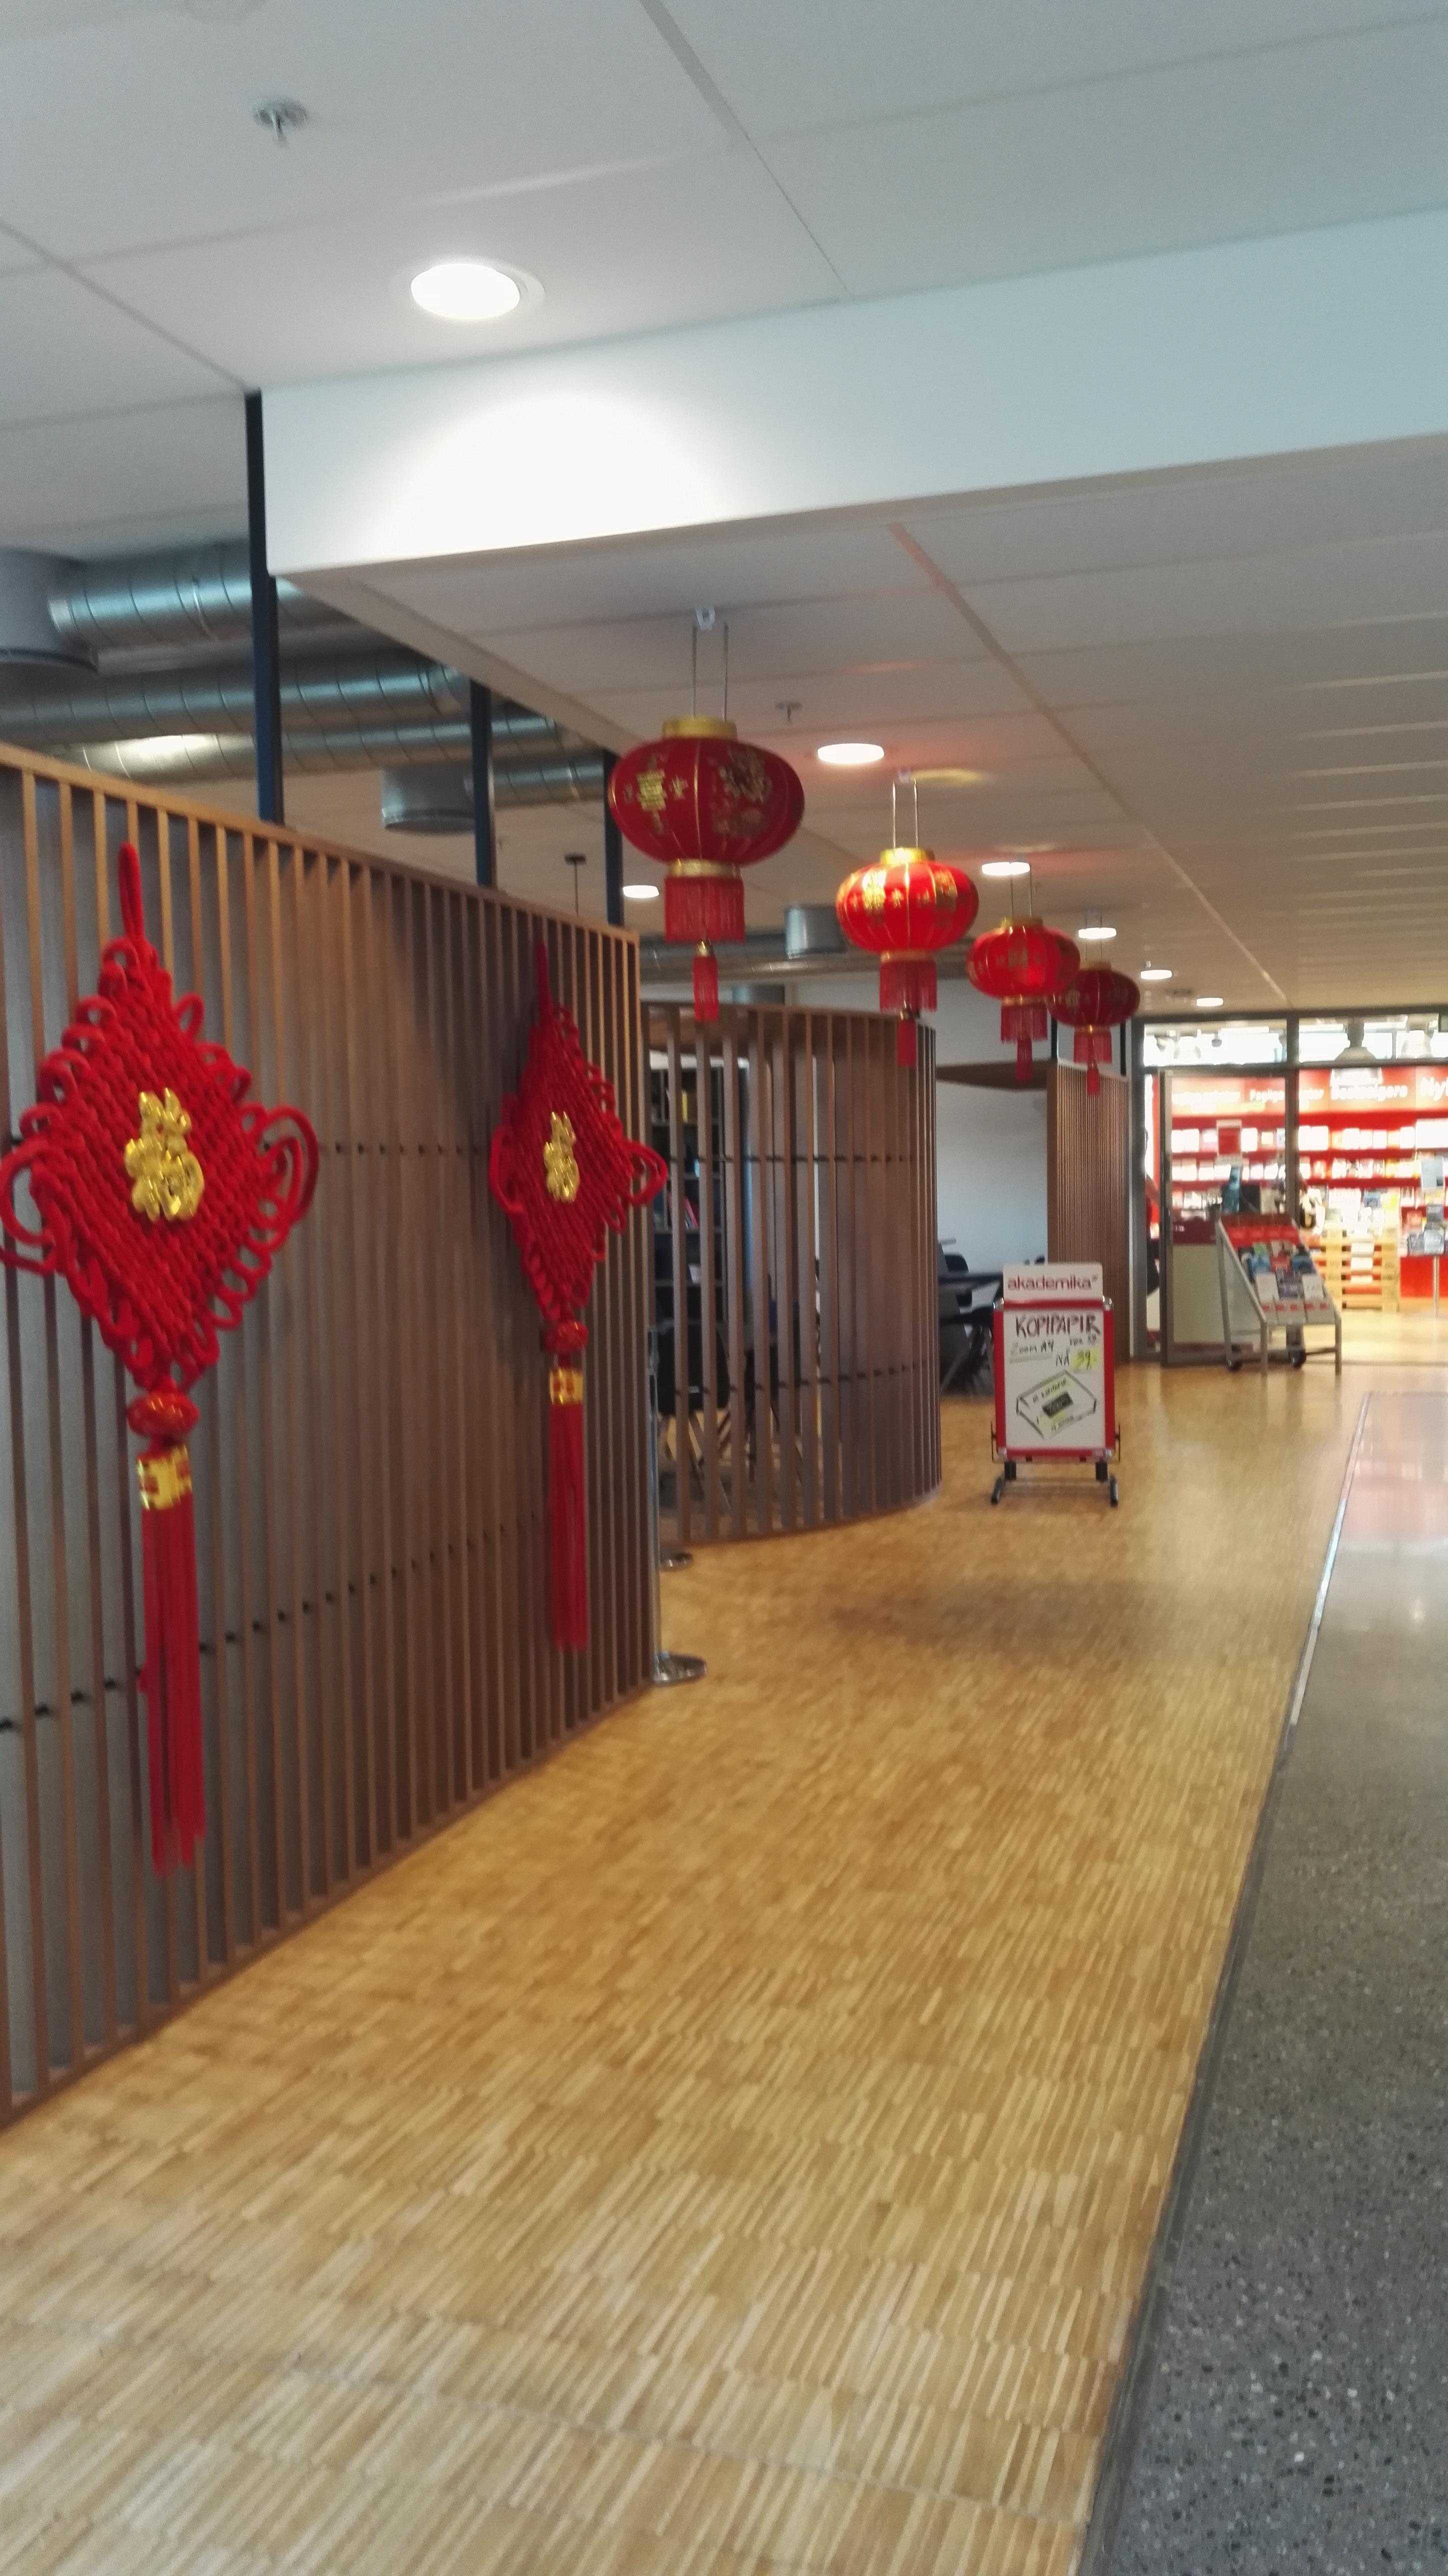 China Day hos BI